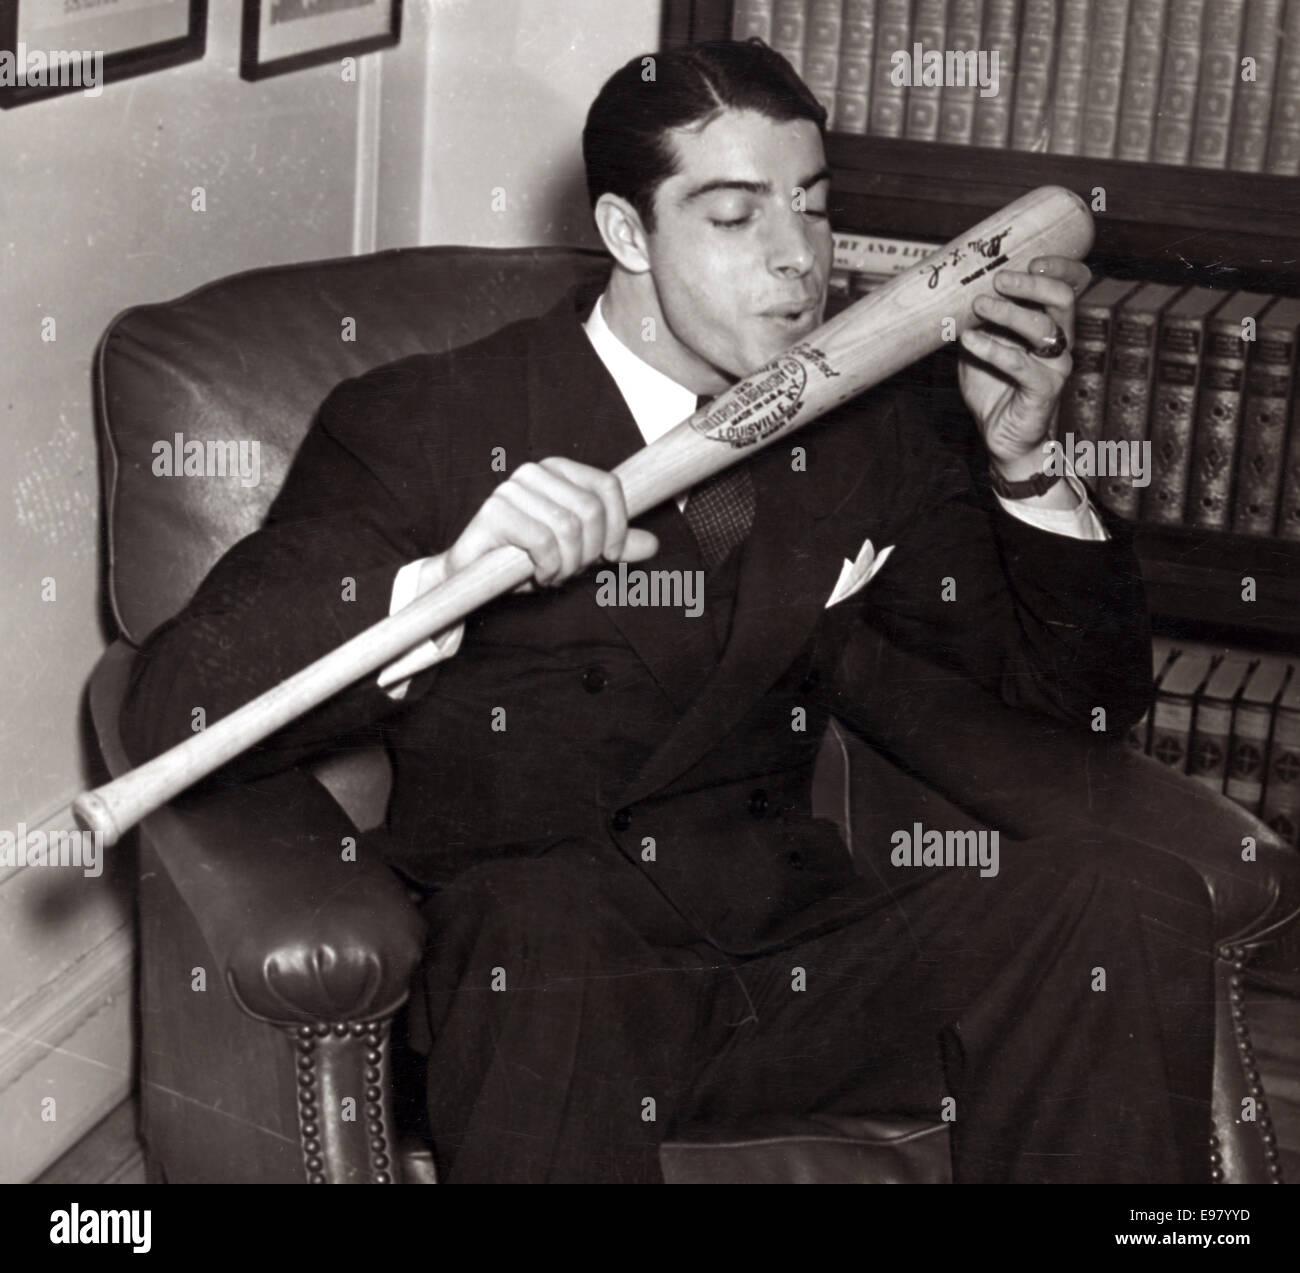 Joe DiMaggio about to kiss his signature baseball bat - Stock Image